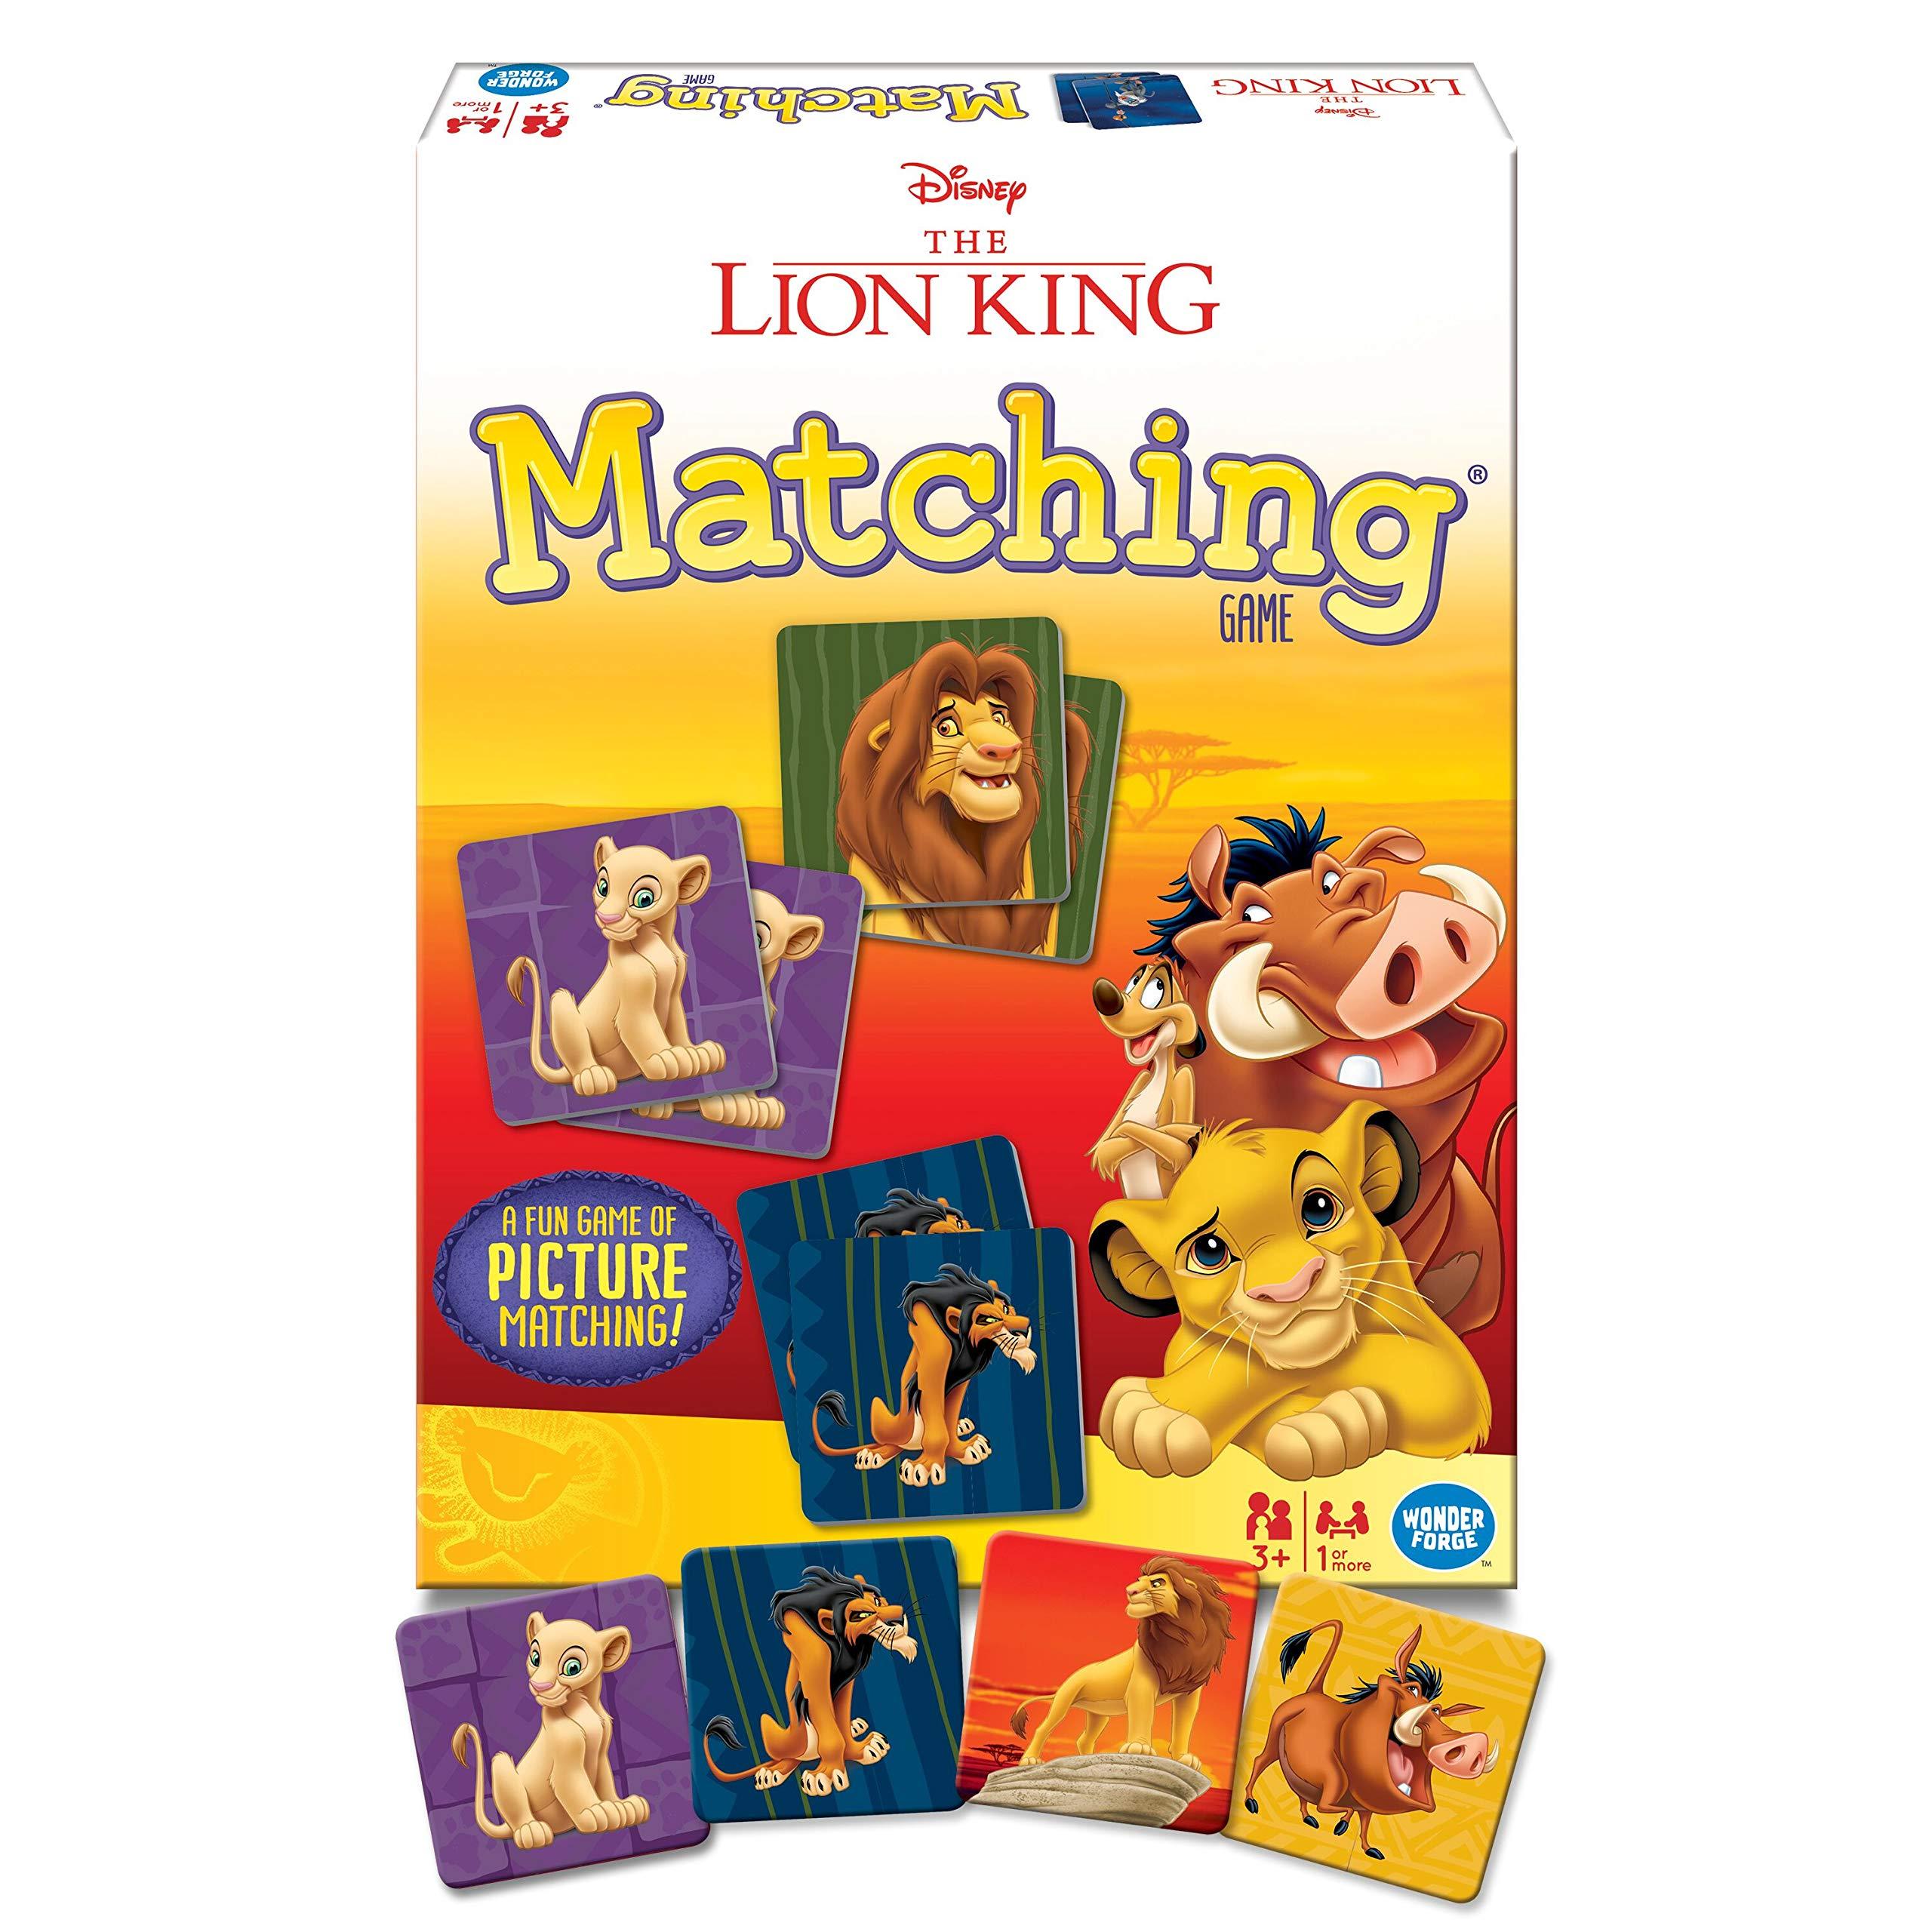 Wonder Forge Disney Lion King Matching Game for Boys & Girls Age 3 & Up - A Fun & Fast Disney Memory Game